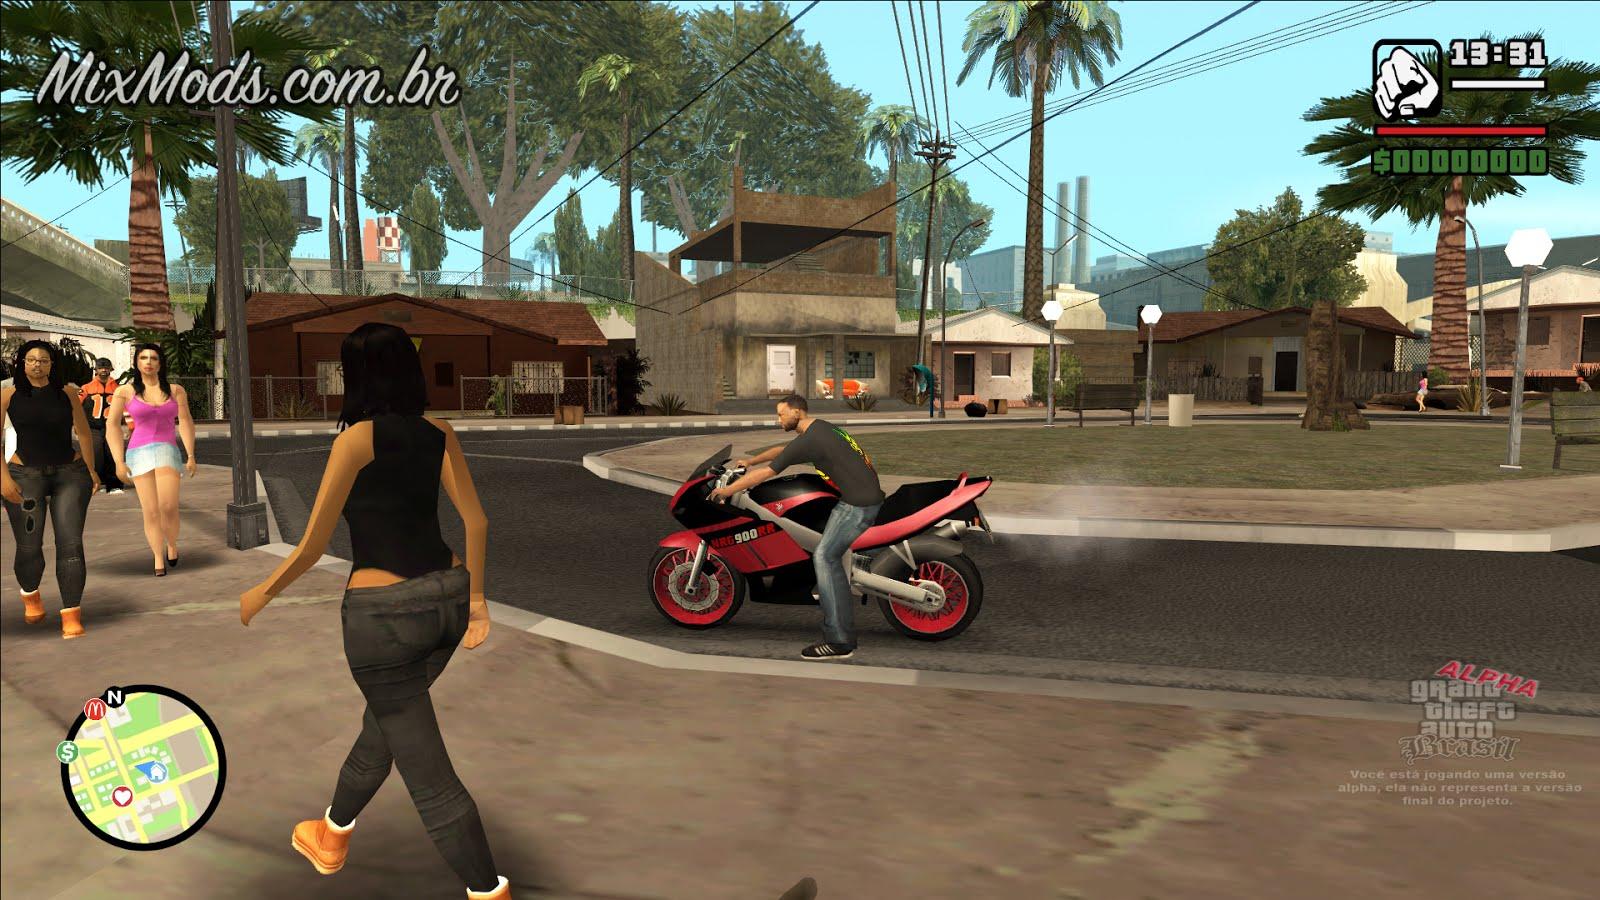 GTA Brasil [PC/PS2/SAMP] - | MixMods | Mods para GTA SA e outros